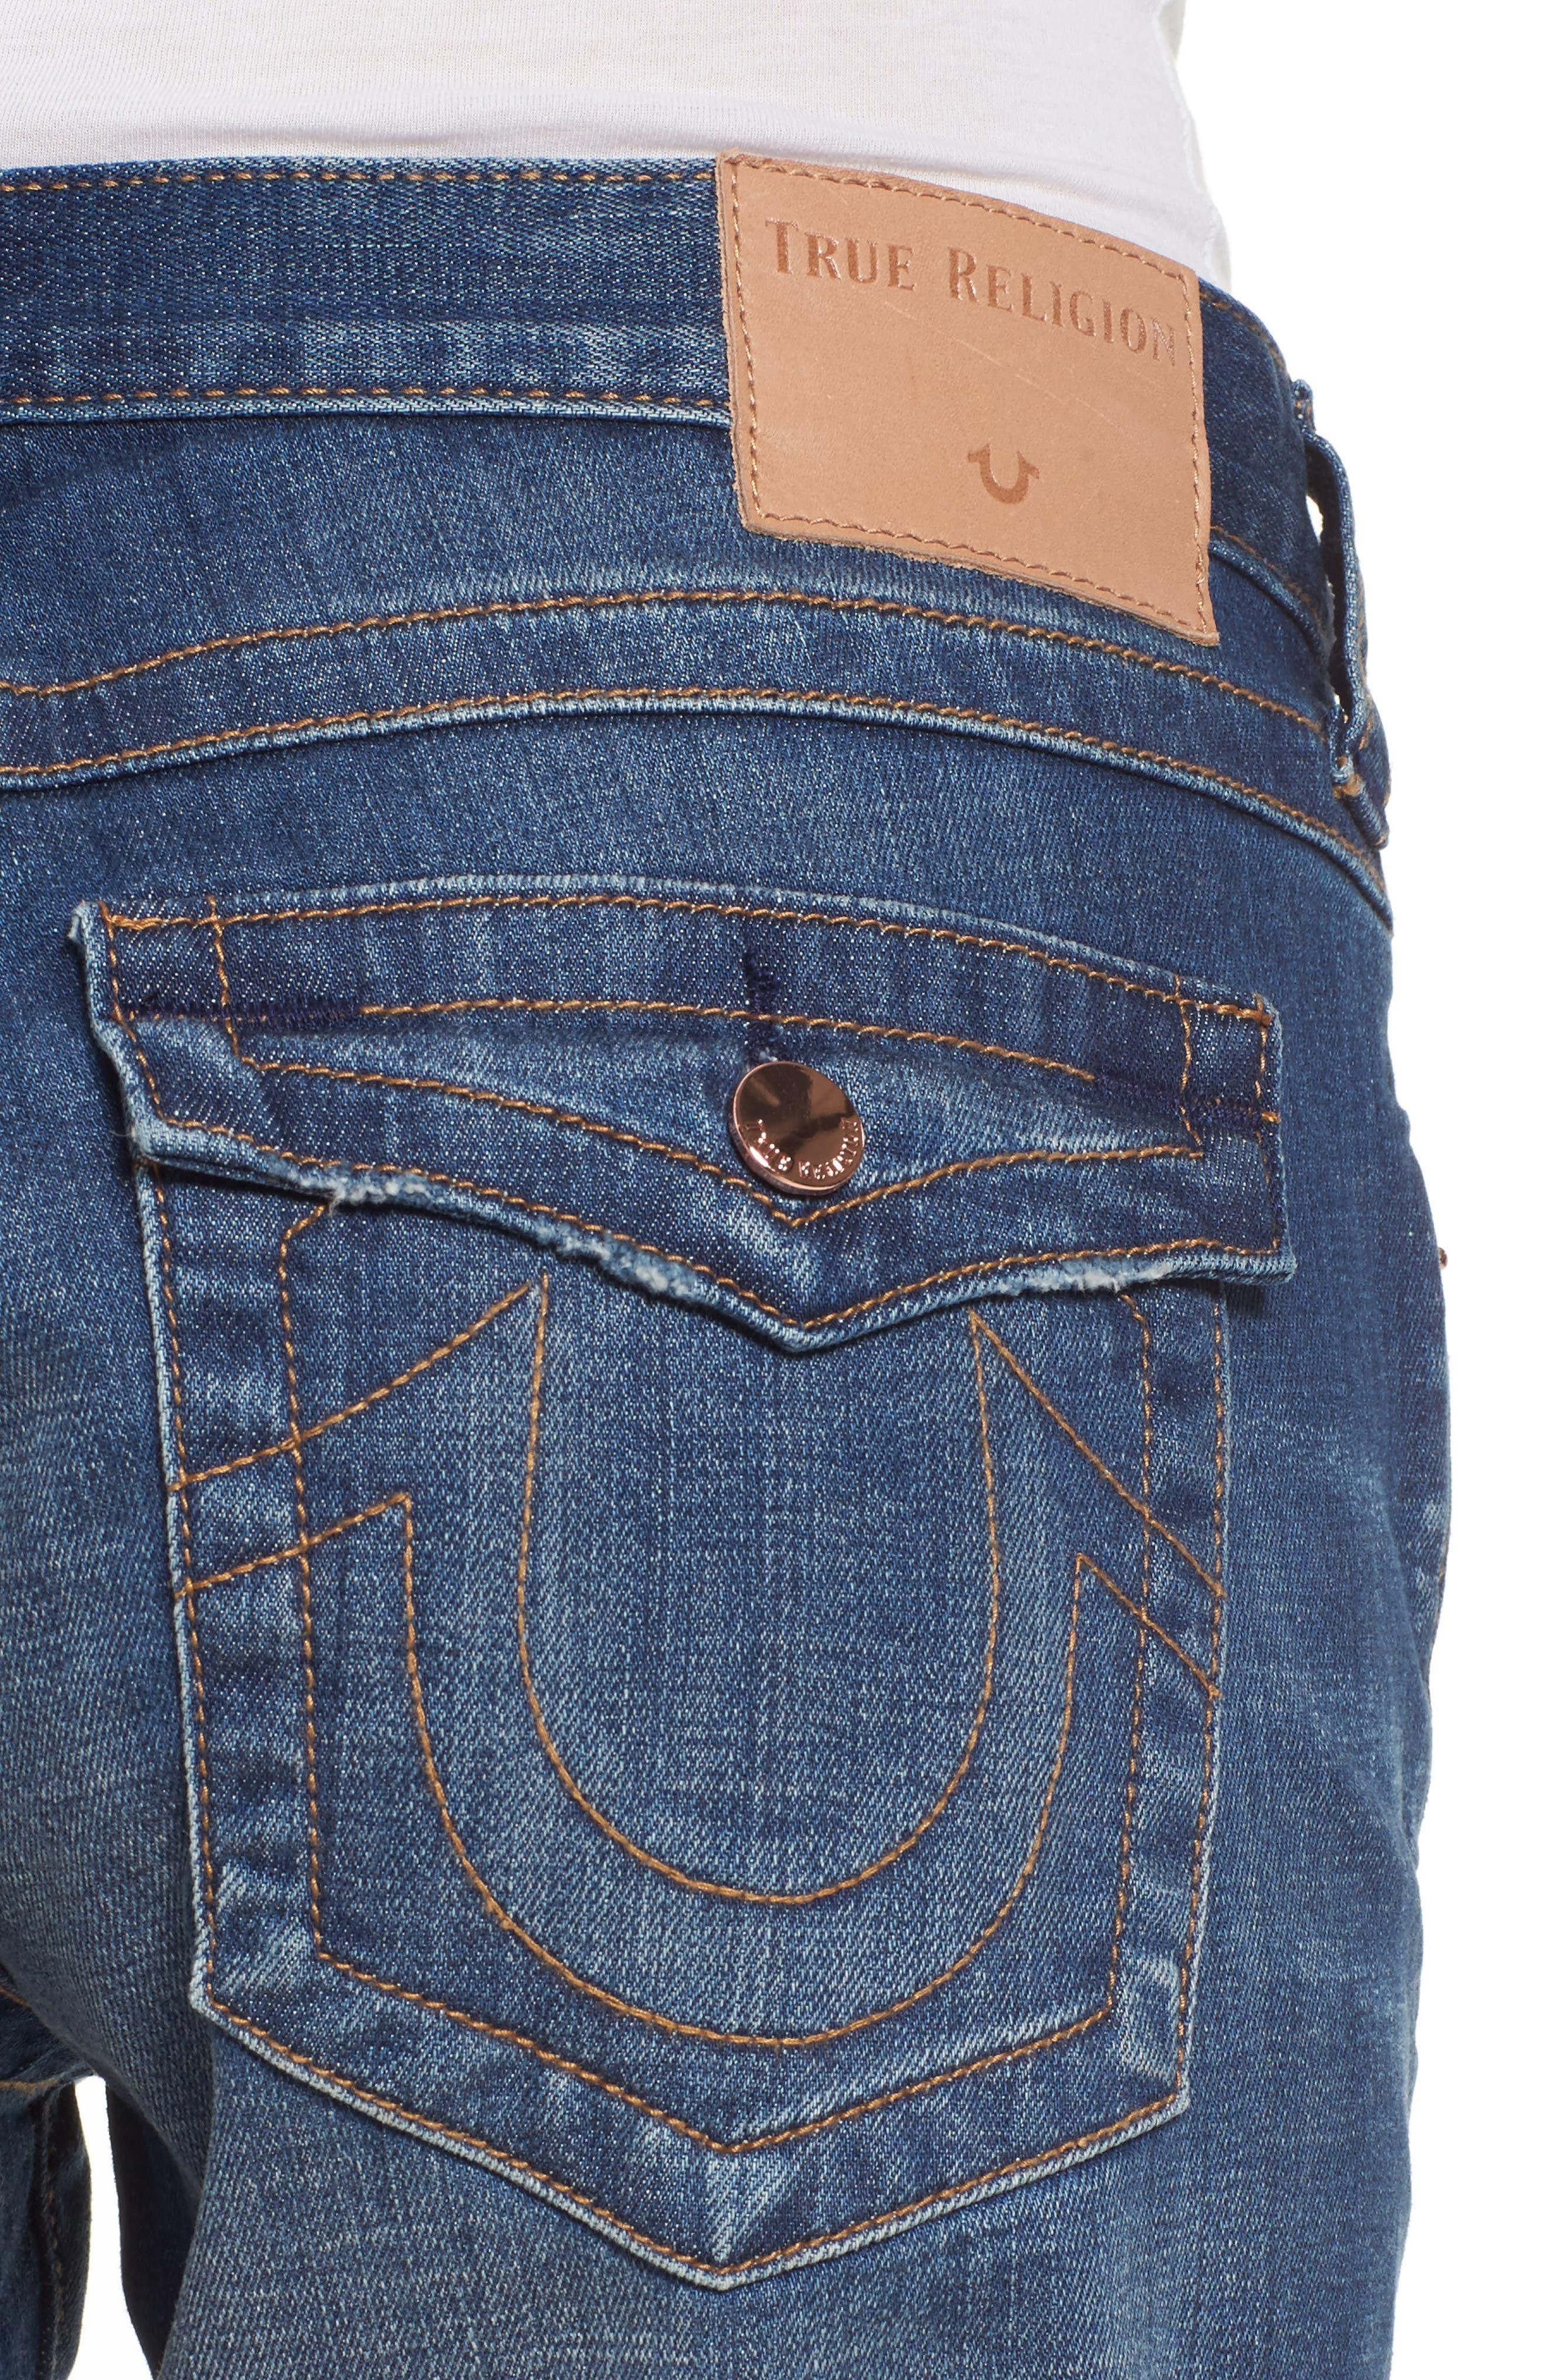 Jayde Shorts,                             Alternate thumbnail 4, color,                             401